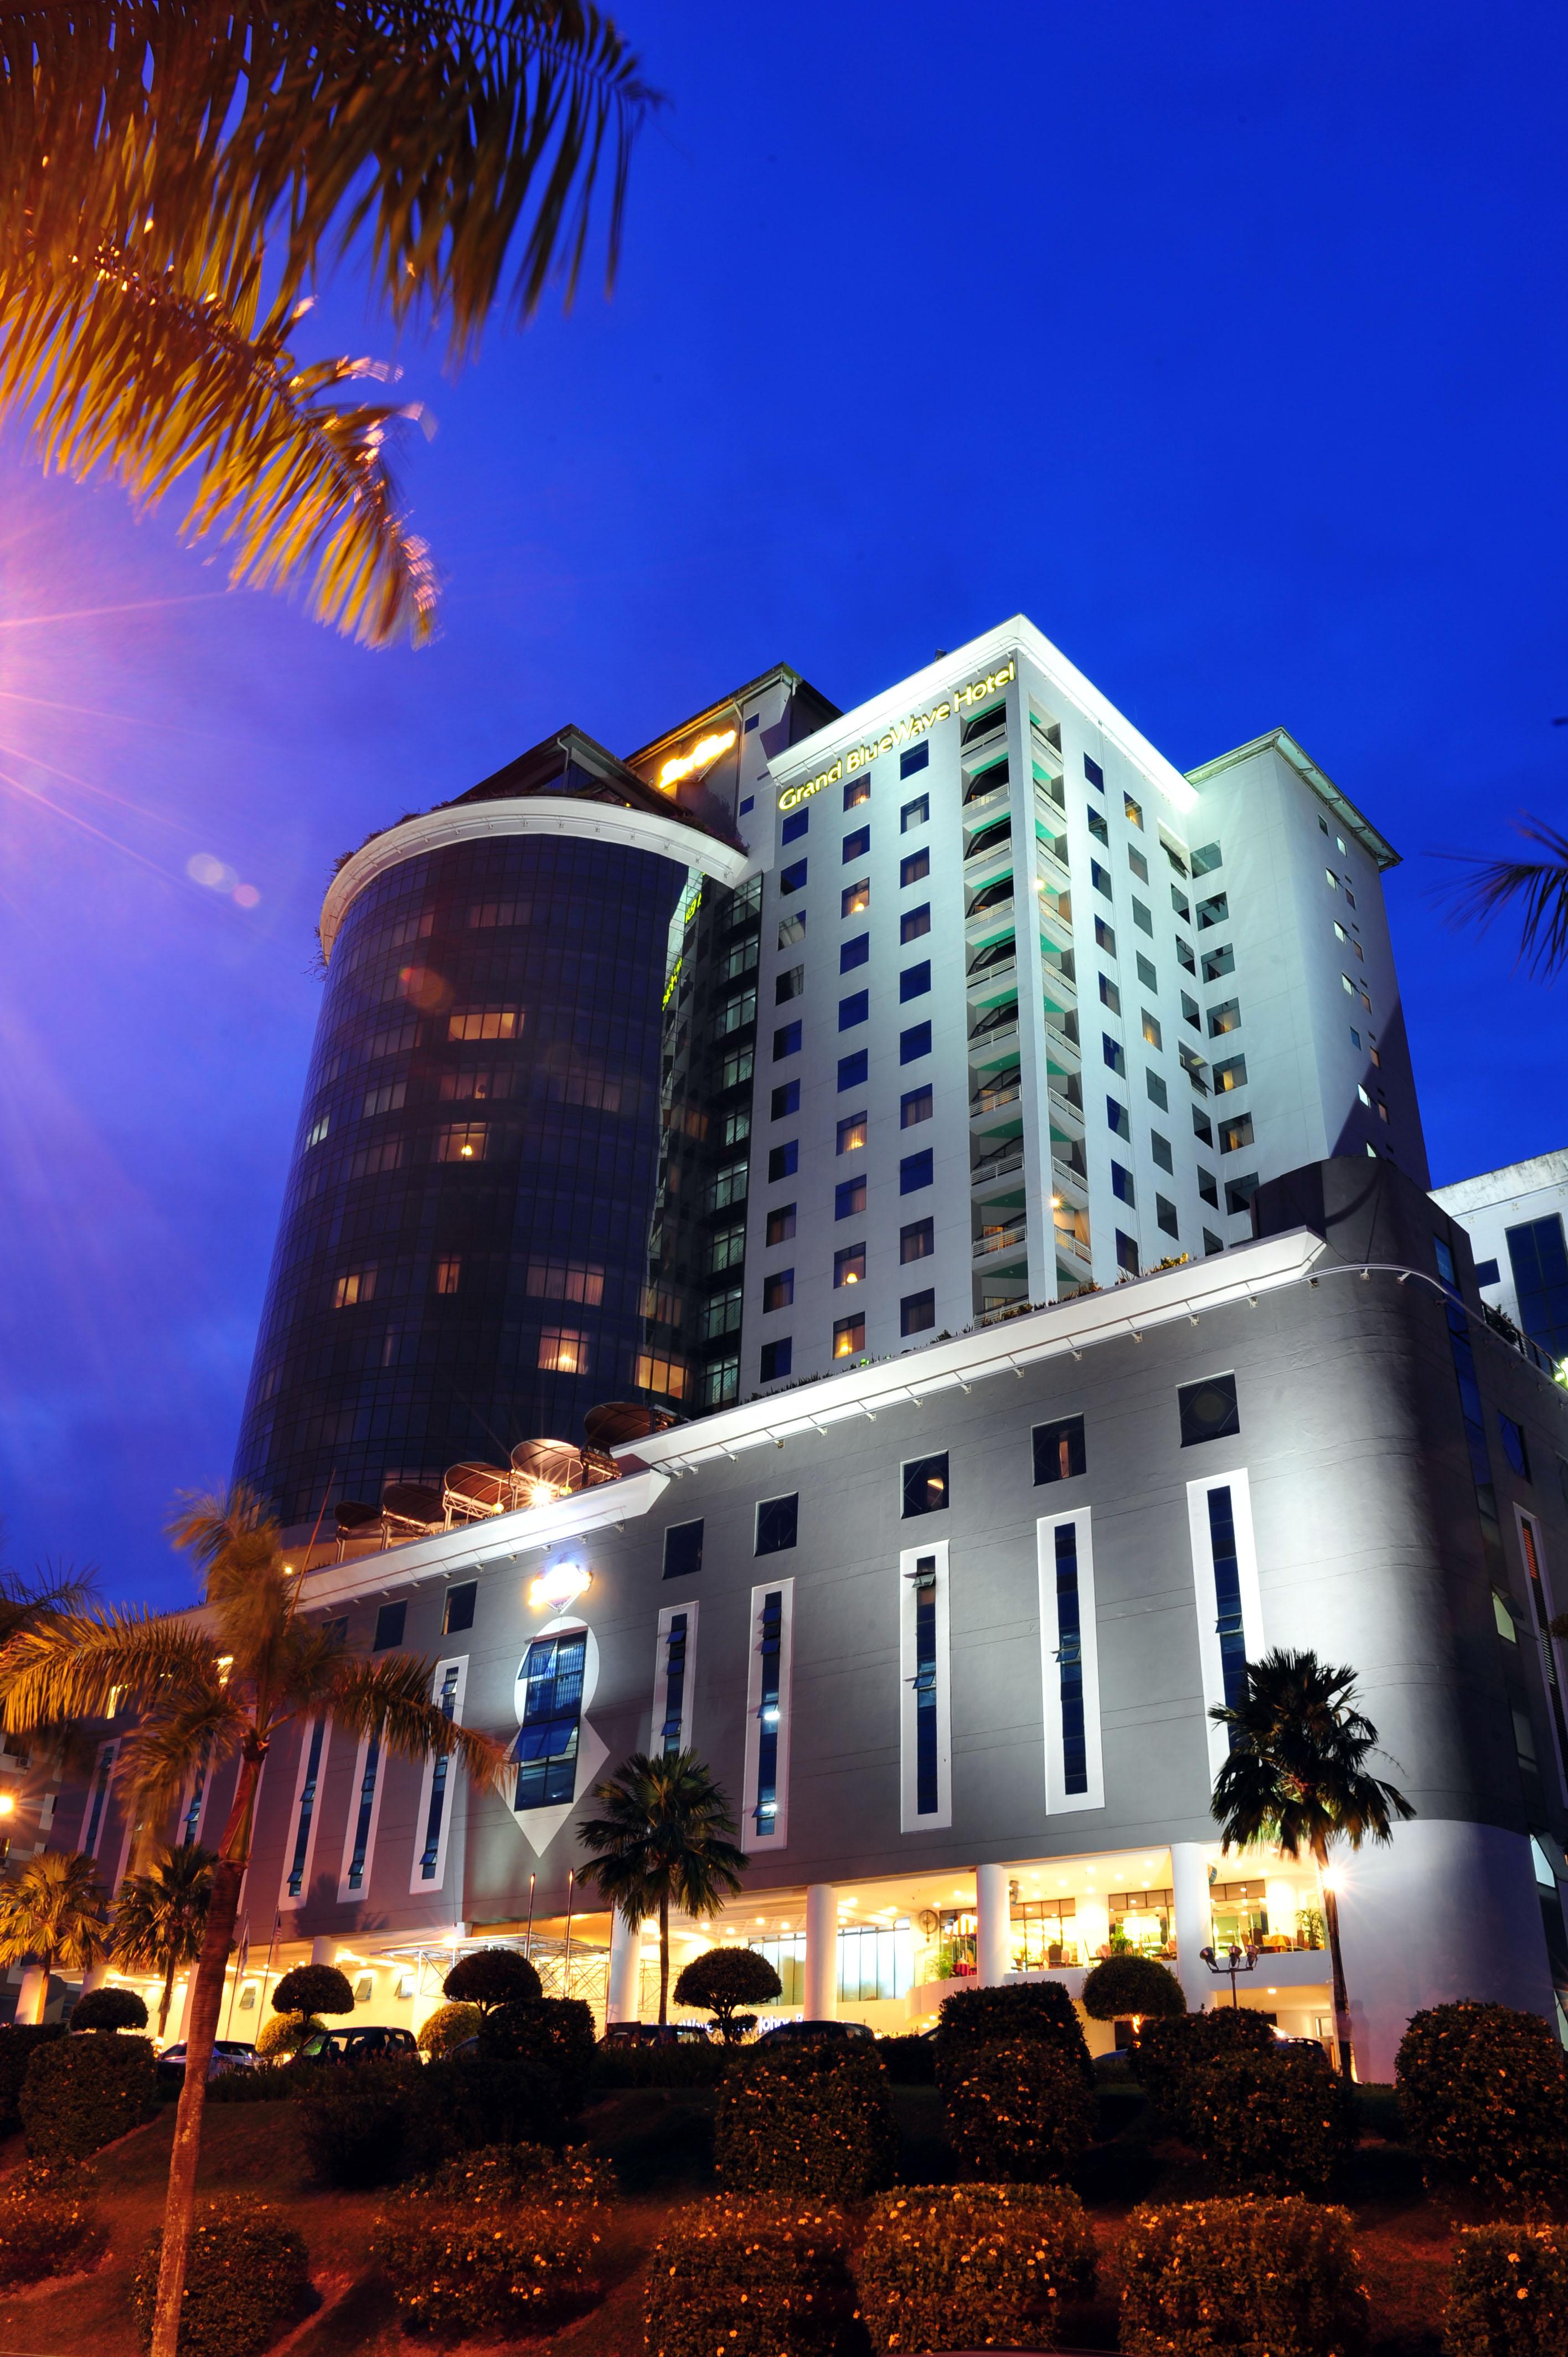 GBW Hotel, Johor Bahru